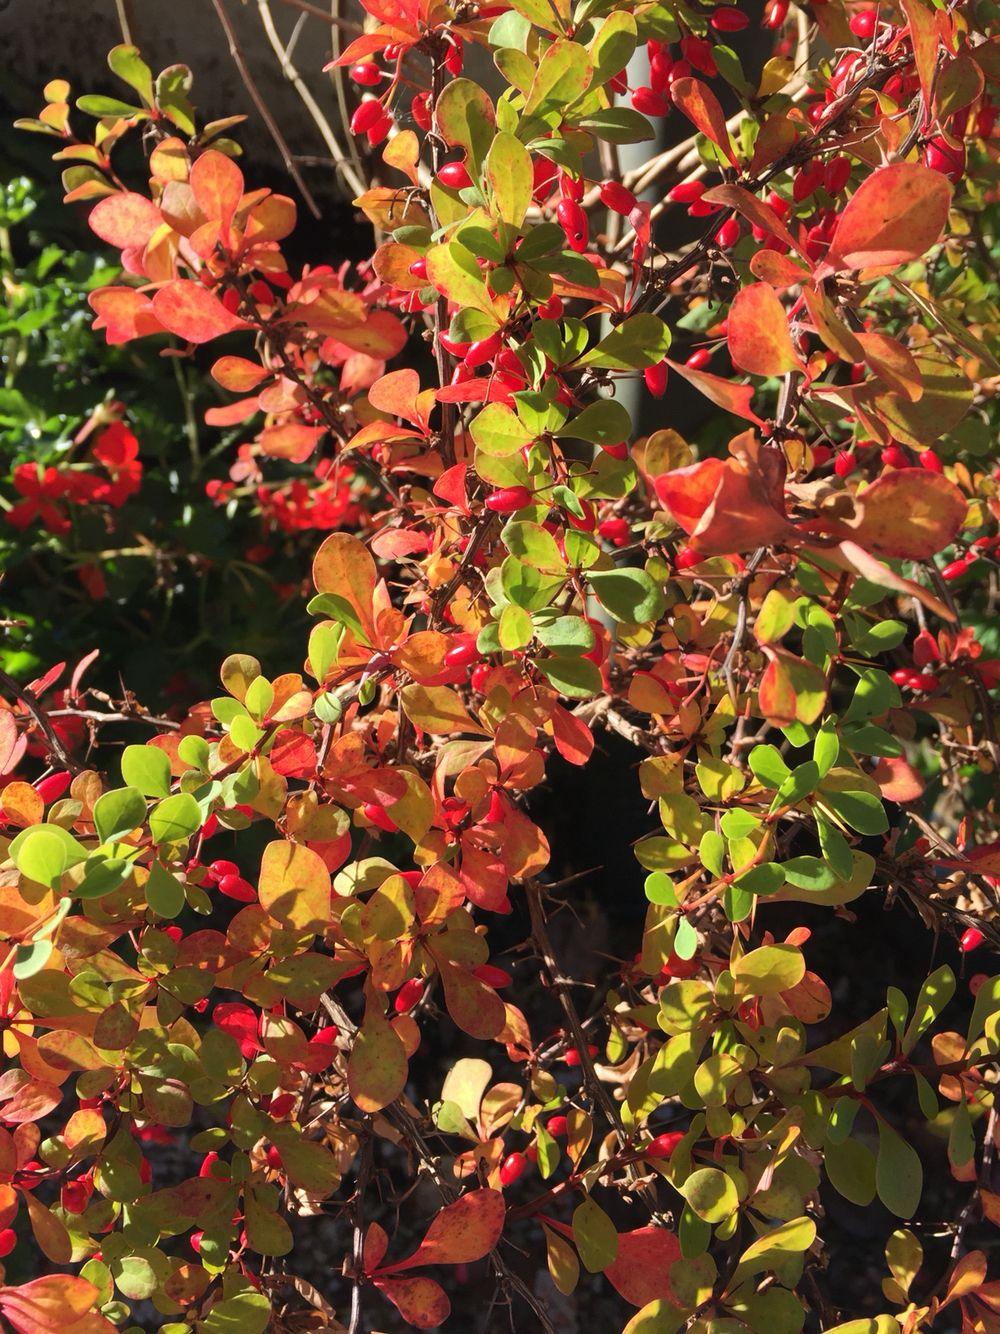 Wonderful autumn colors in my garden Margeritten 10/5/15 by Inger Johanne